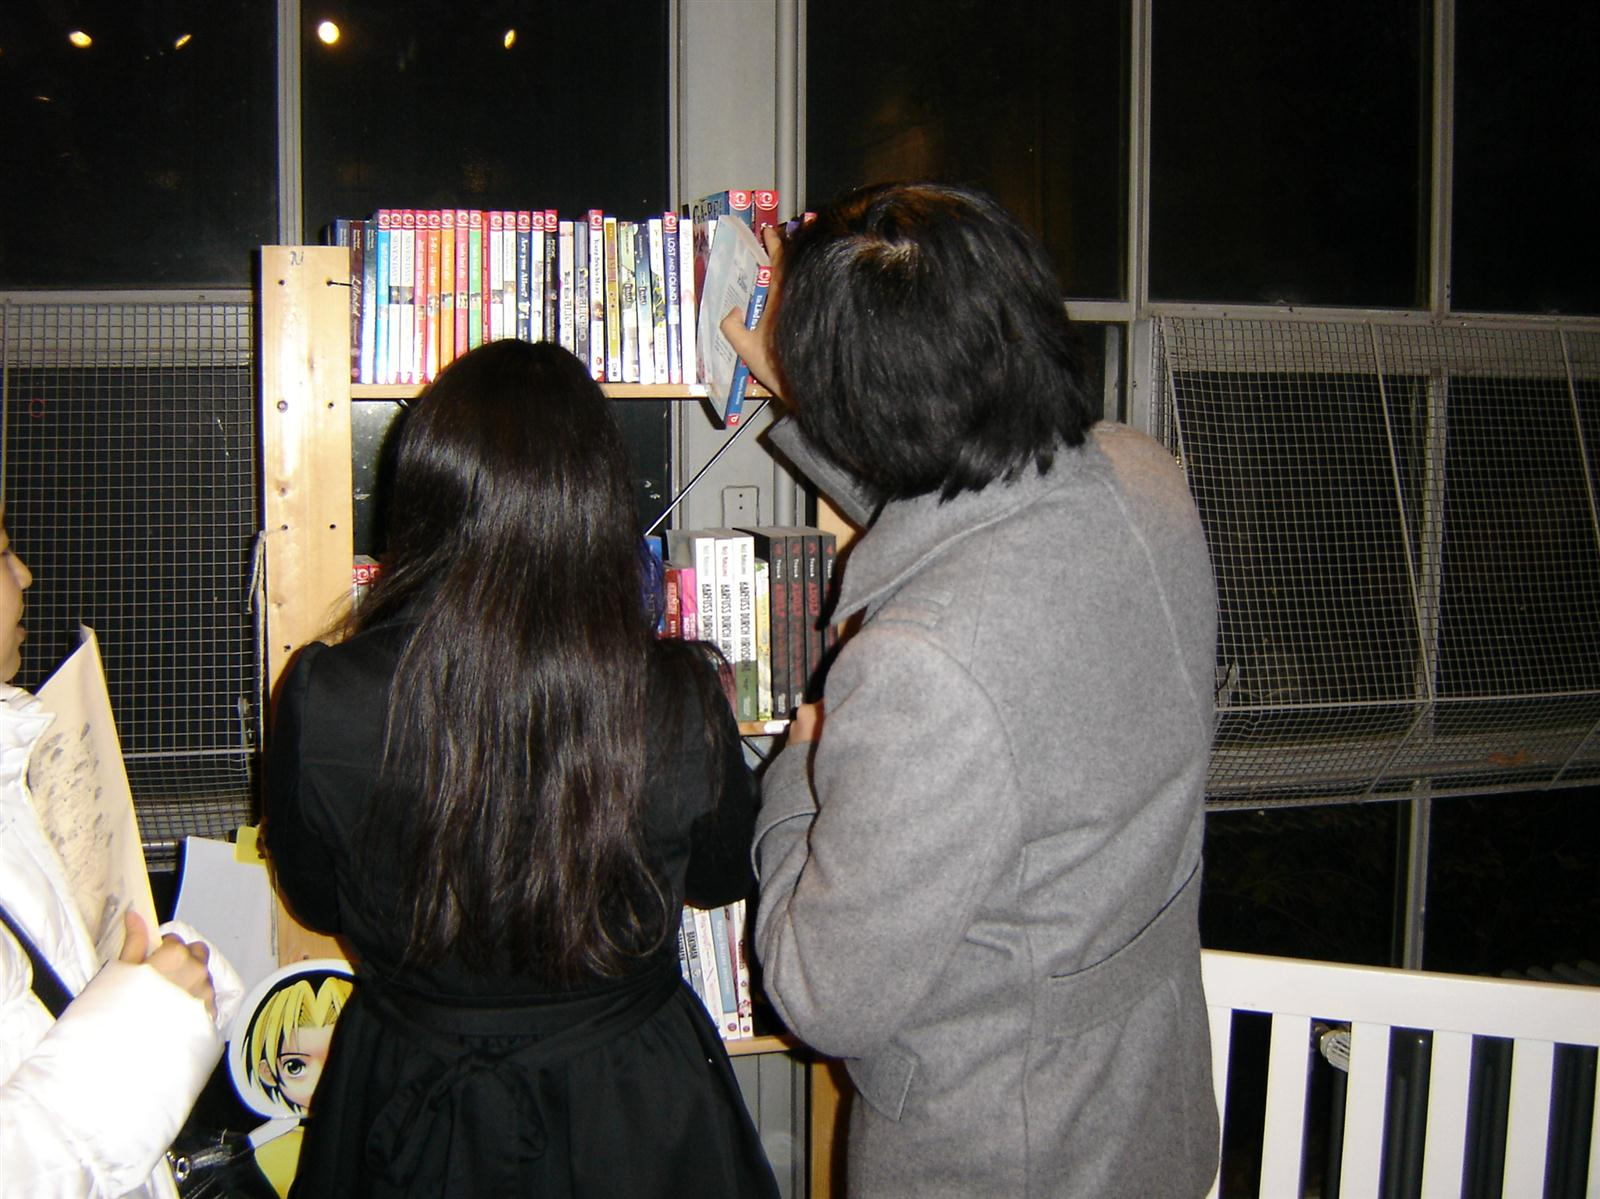 Japan_Week_2011_Wie.MAI.KAI_Leseecke_Palmengarten_wmk_004